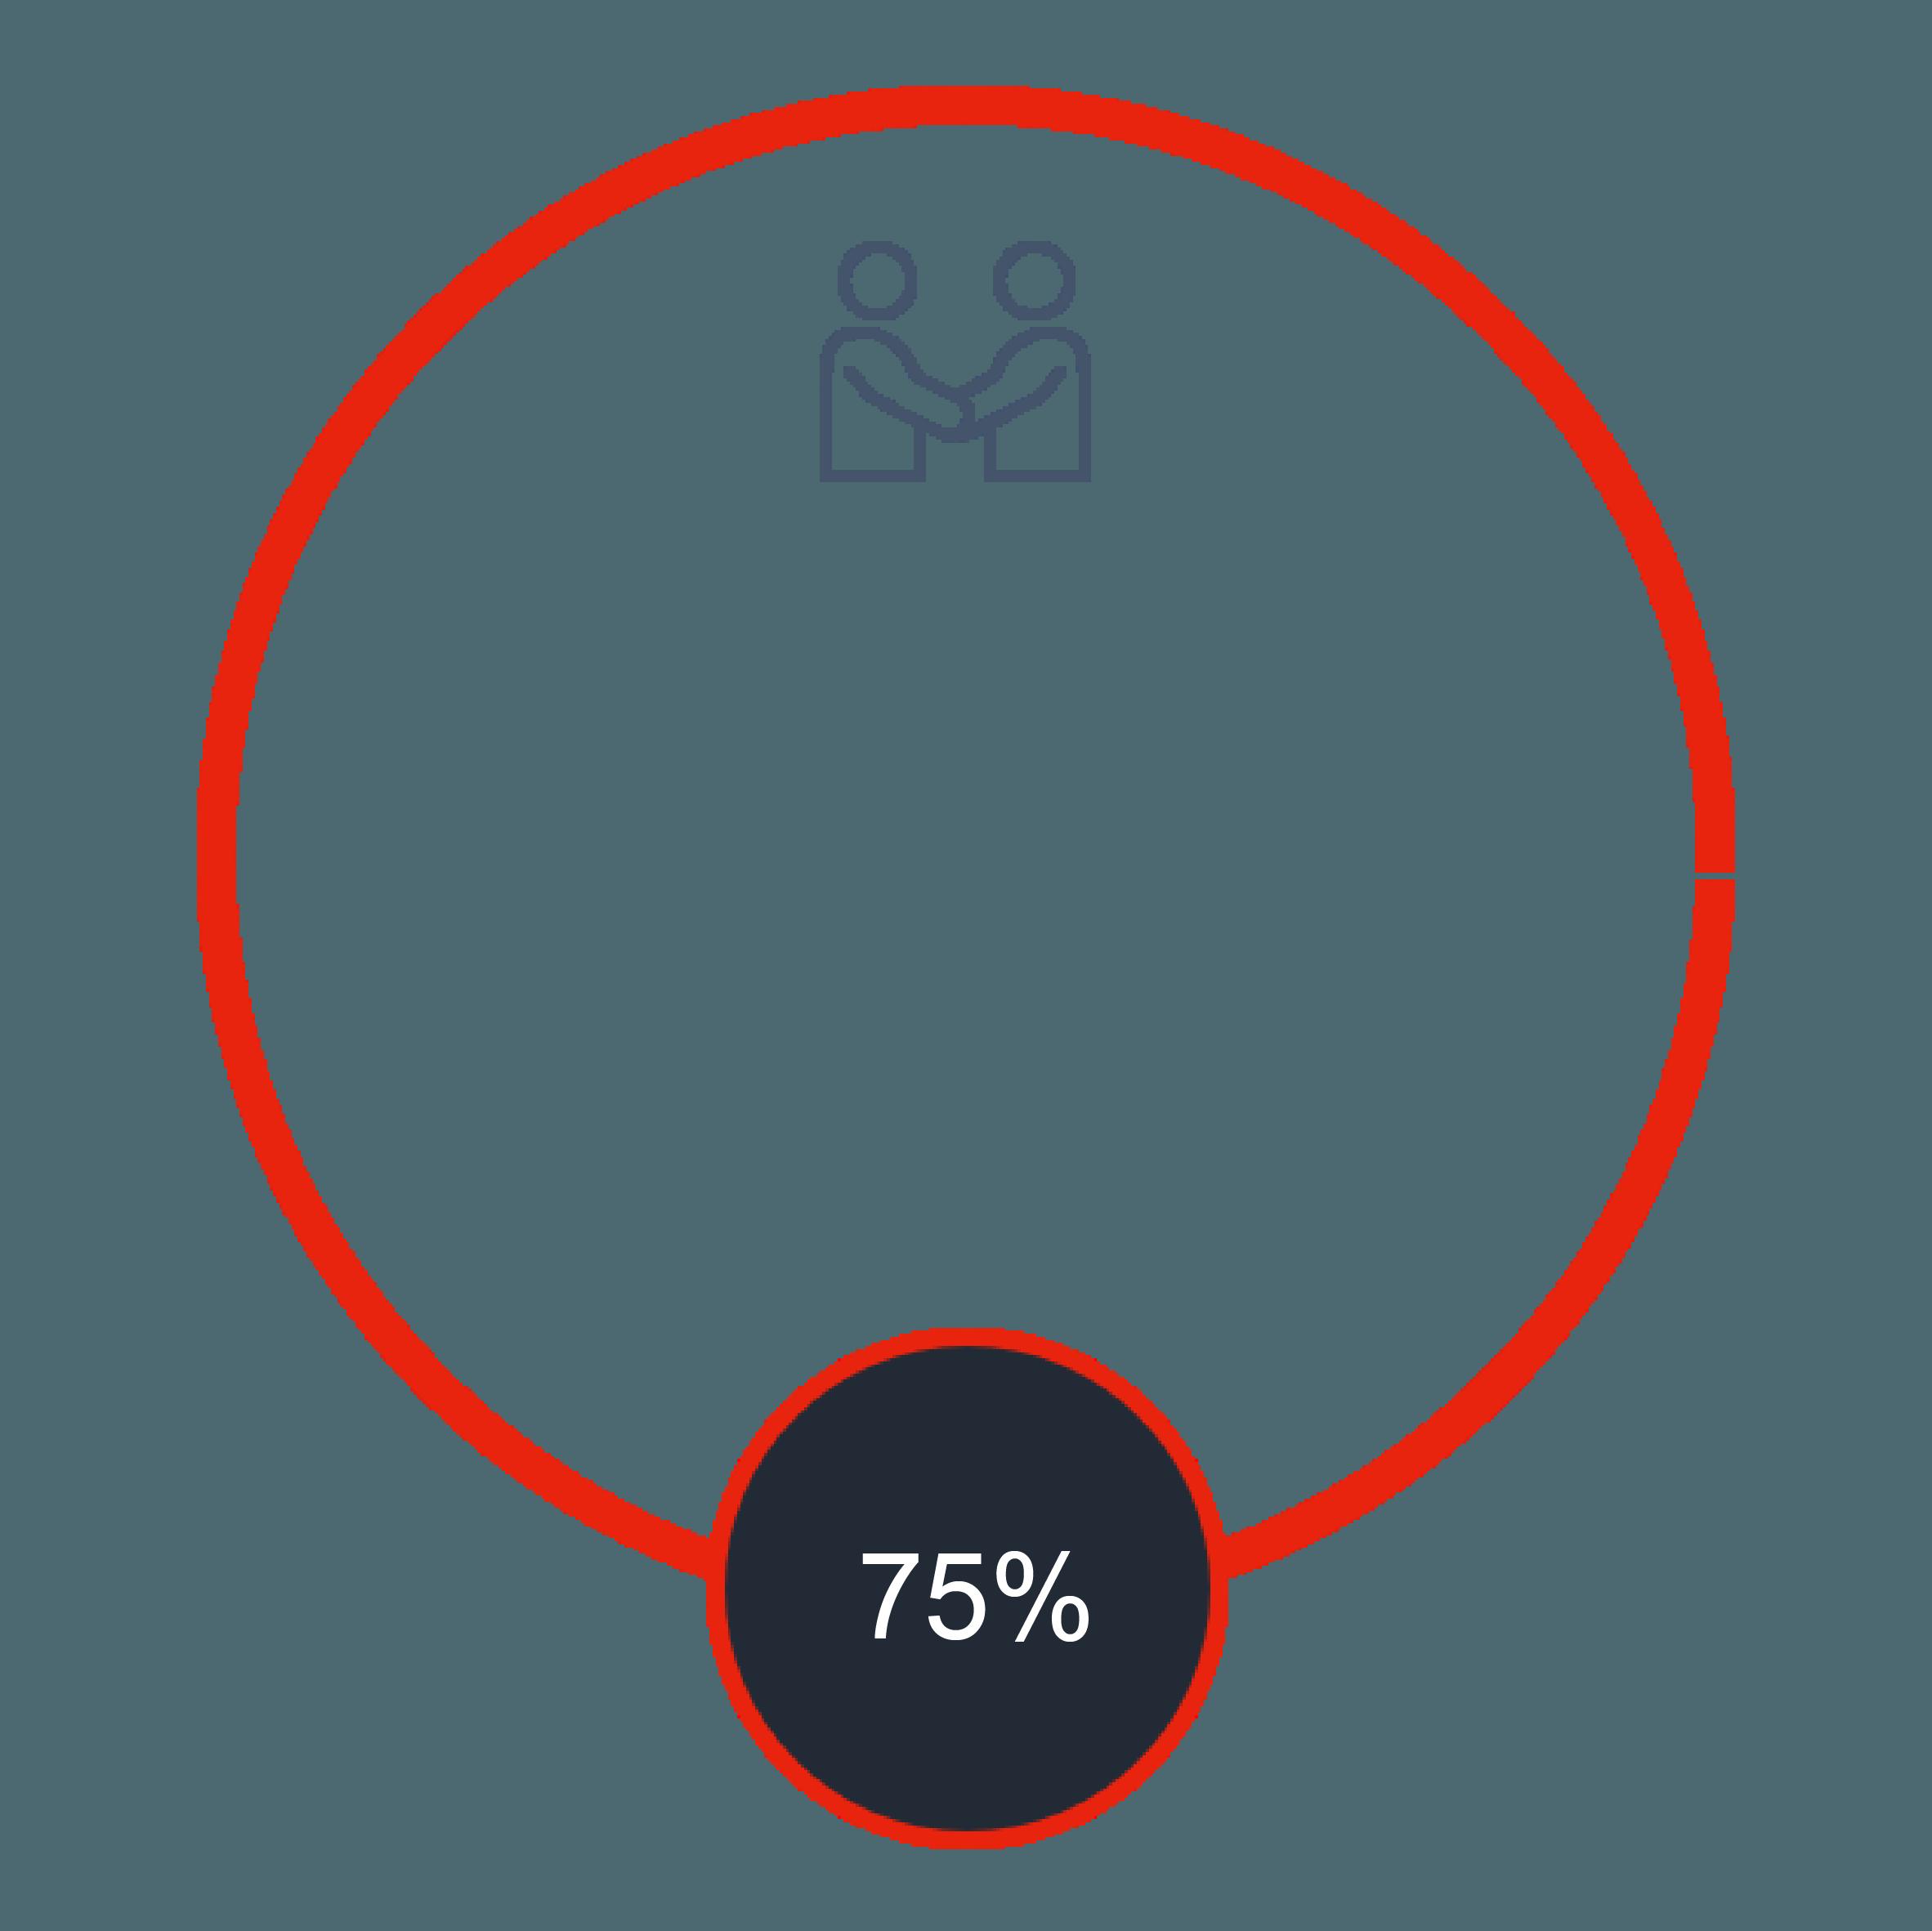 75% graph